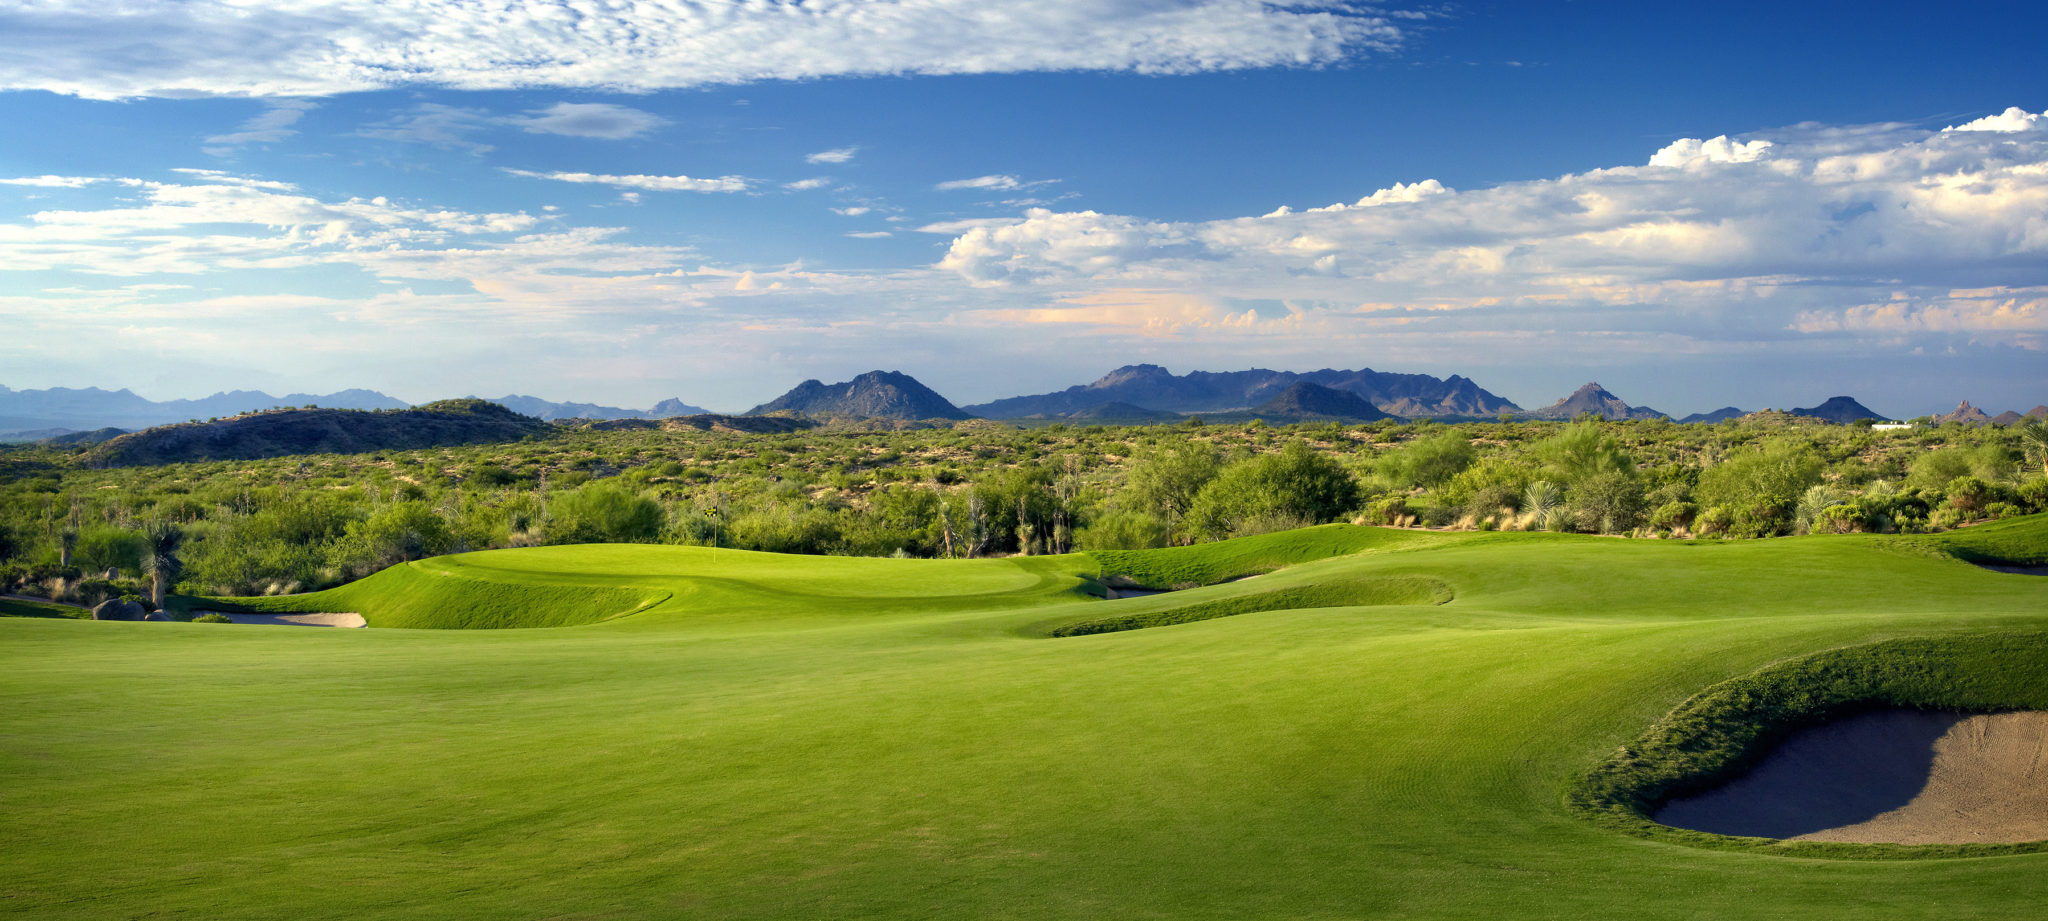 Desert_Mountain_Golf_Outlaw